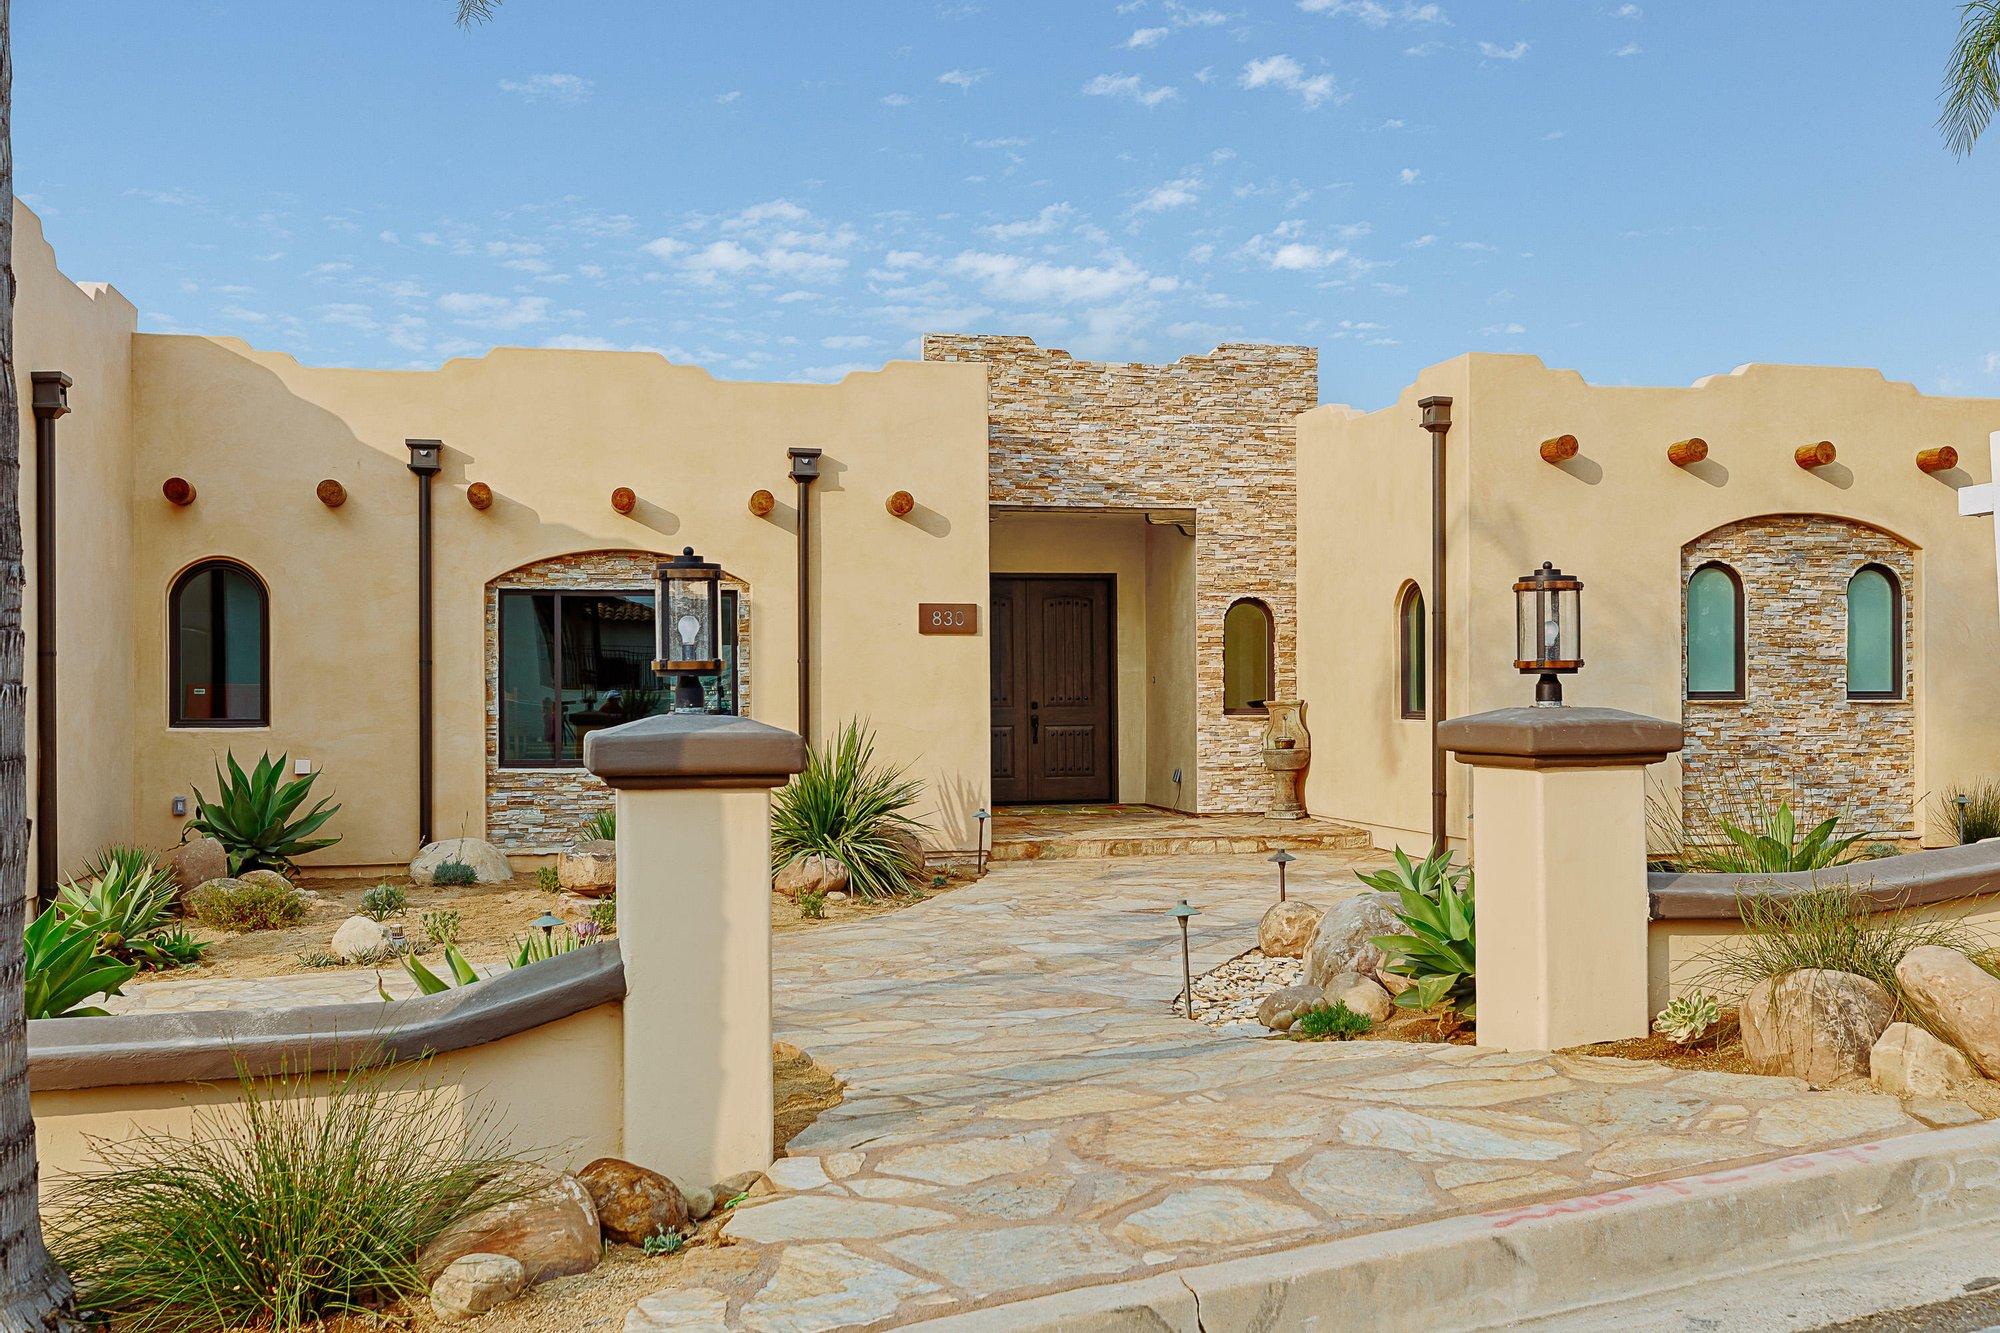 House in Ventura, California, United States 1